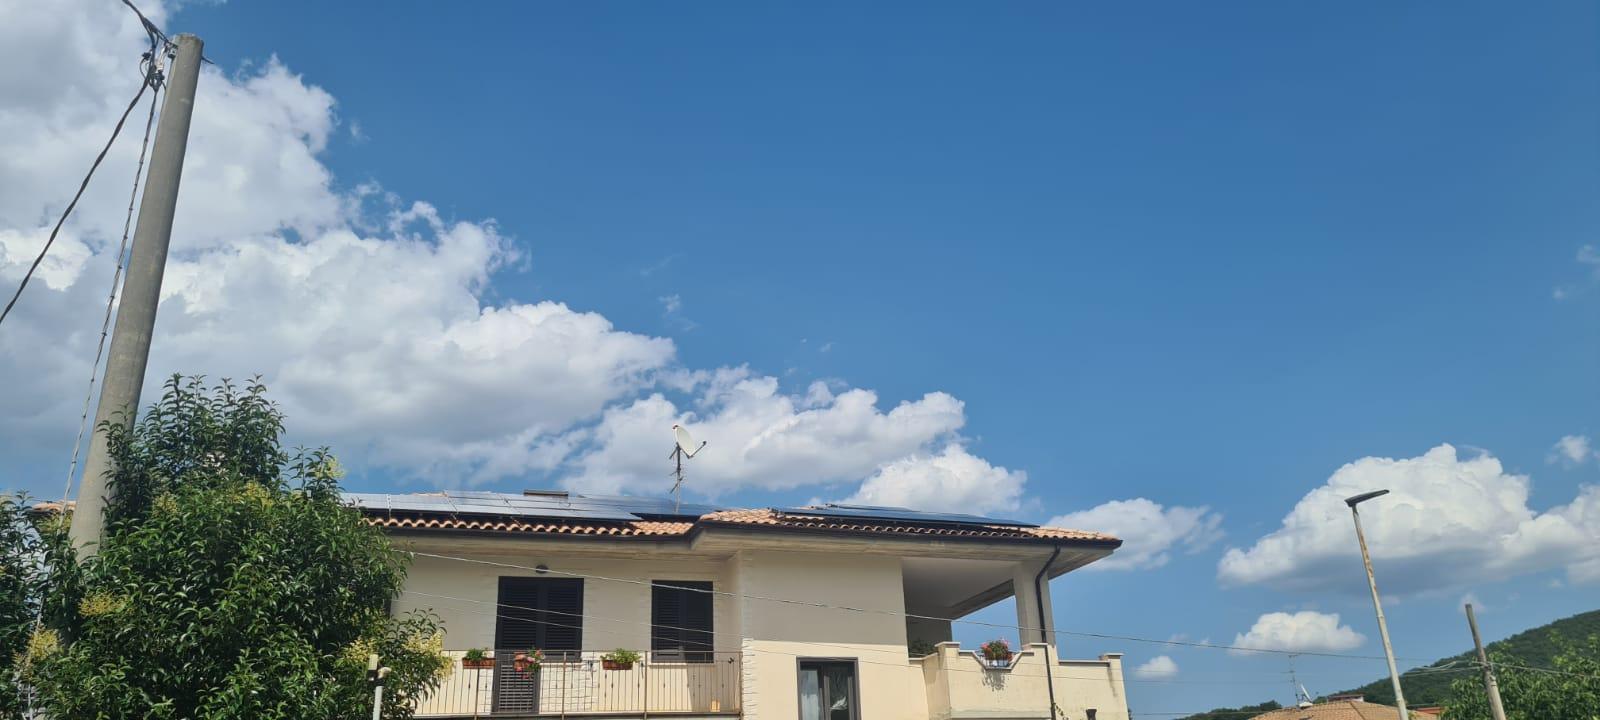 Impianto Fotovoltaico 13,6kWp Moduli SunPower Inverter Huawei - Sant'Agapito (IS)